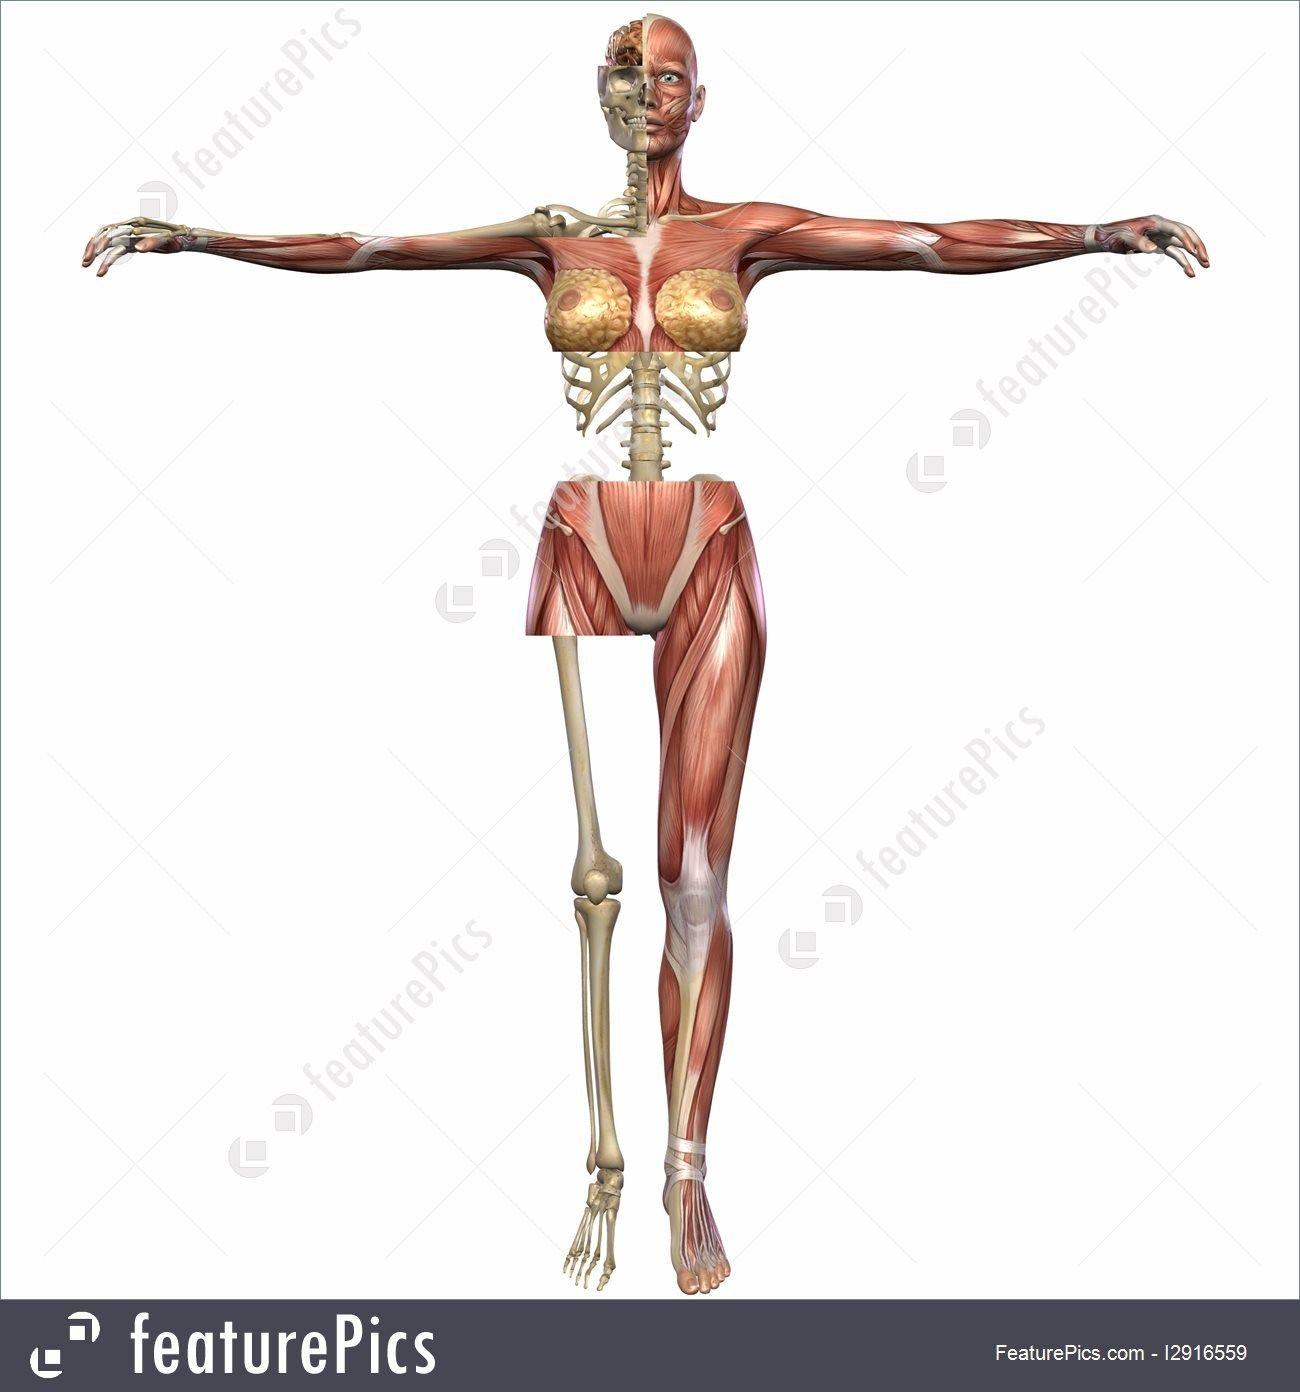 Free Female Anatomy Photos Human Anatomy Pictures Human Anatomy